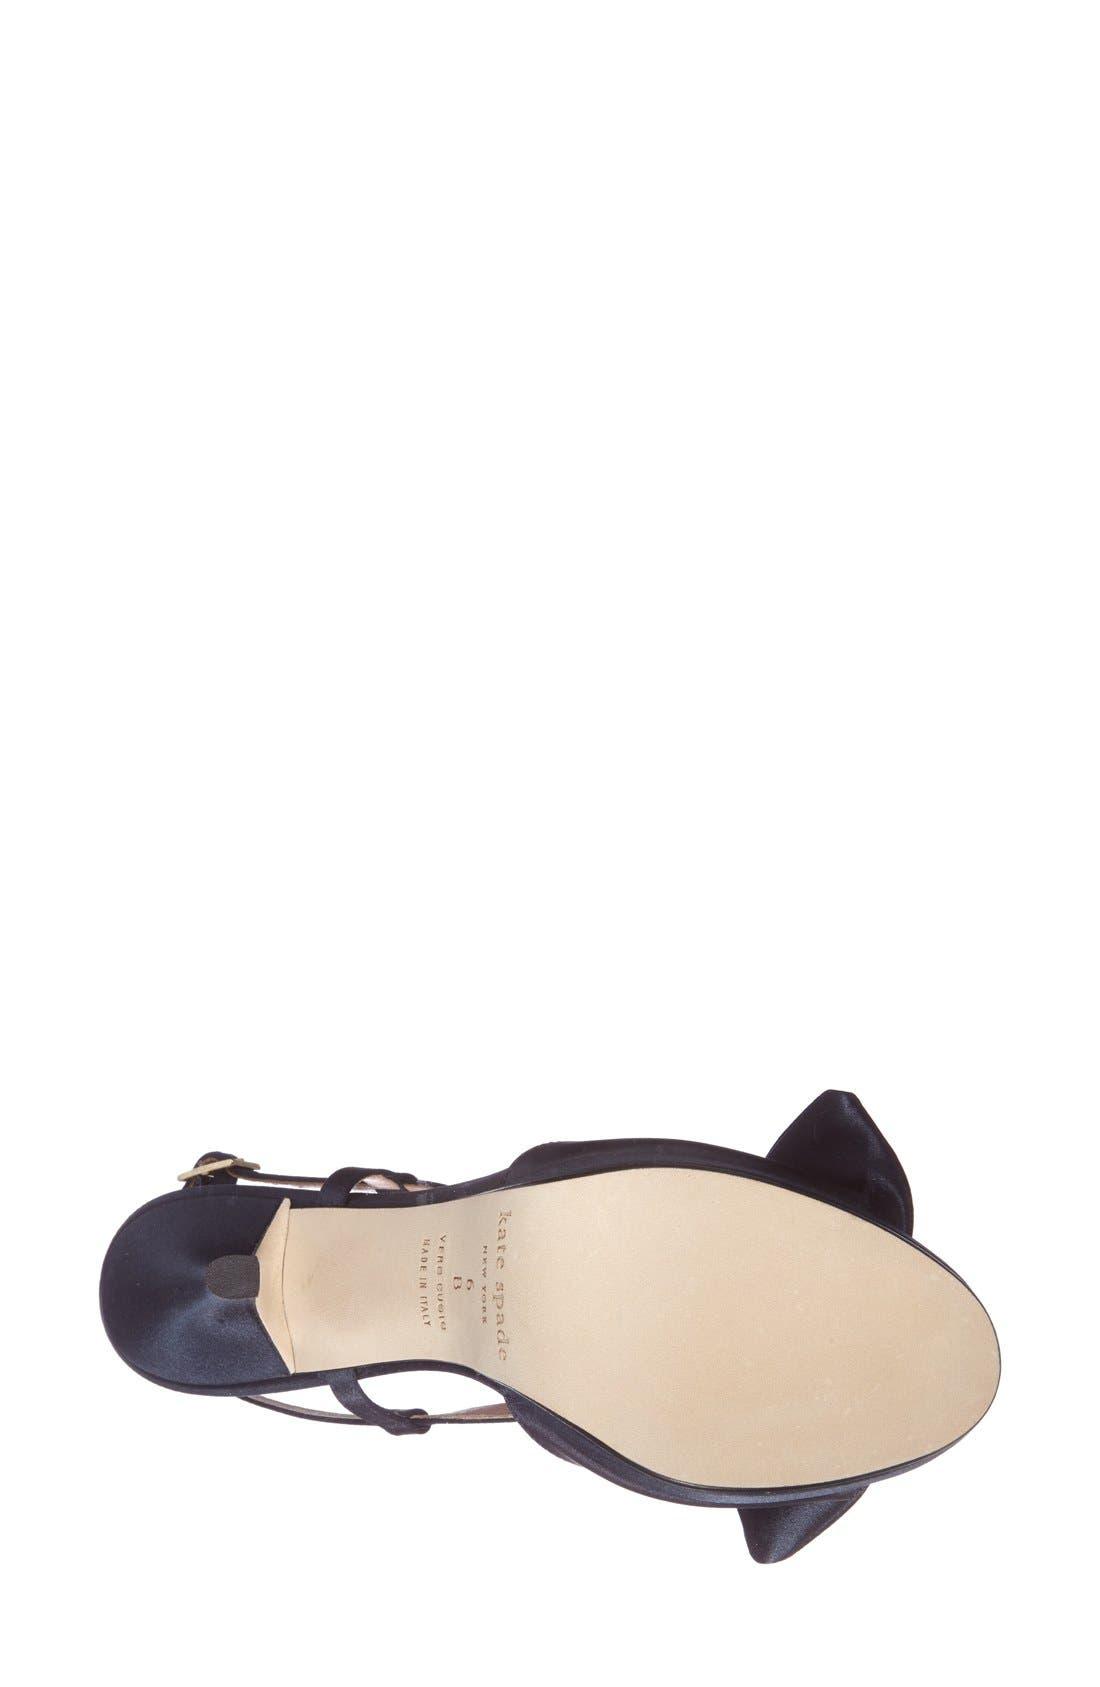 Alternate Image 4  - kate spade new york 'rezza' platform sandal (Women)